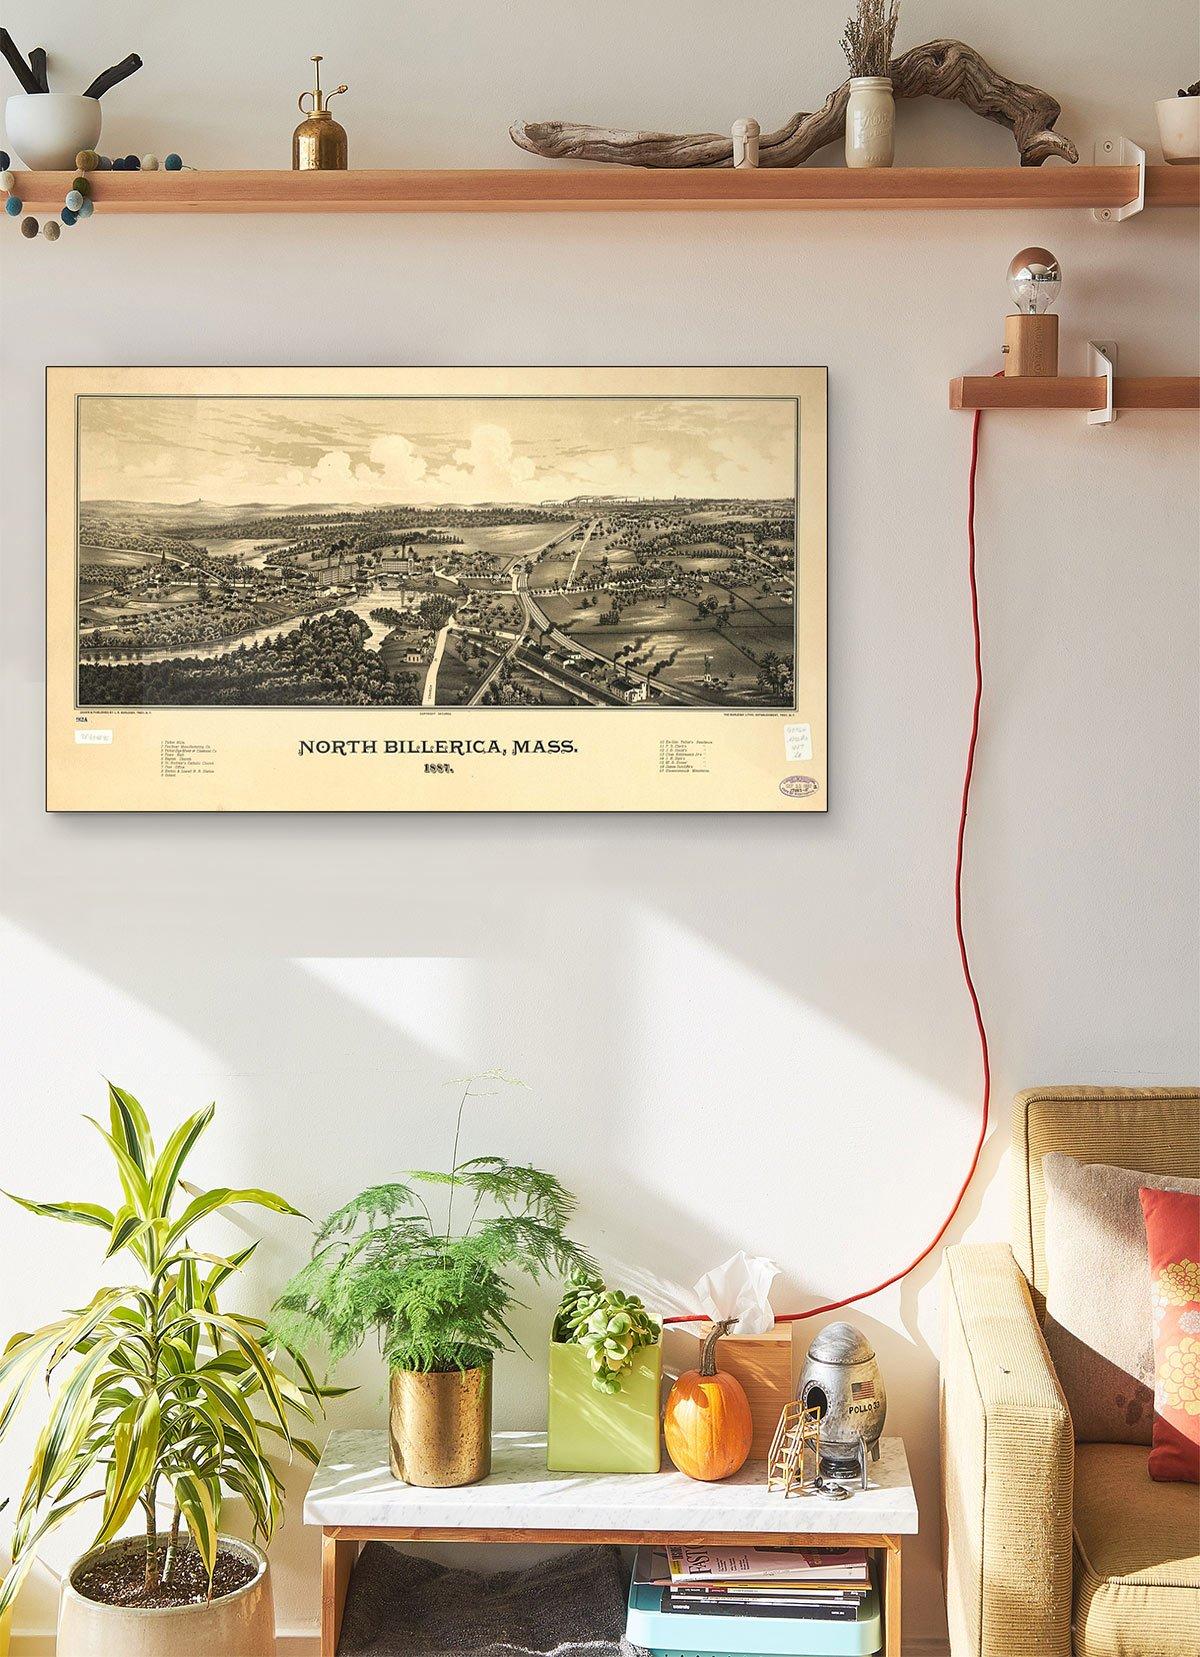 North Billerica Mass 1887 LARGE Vintage Map